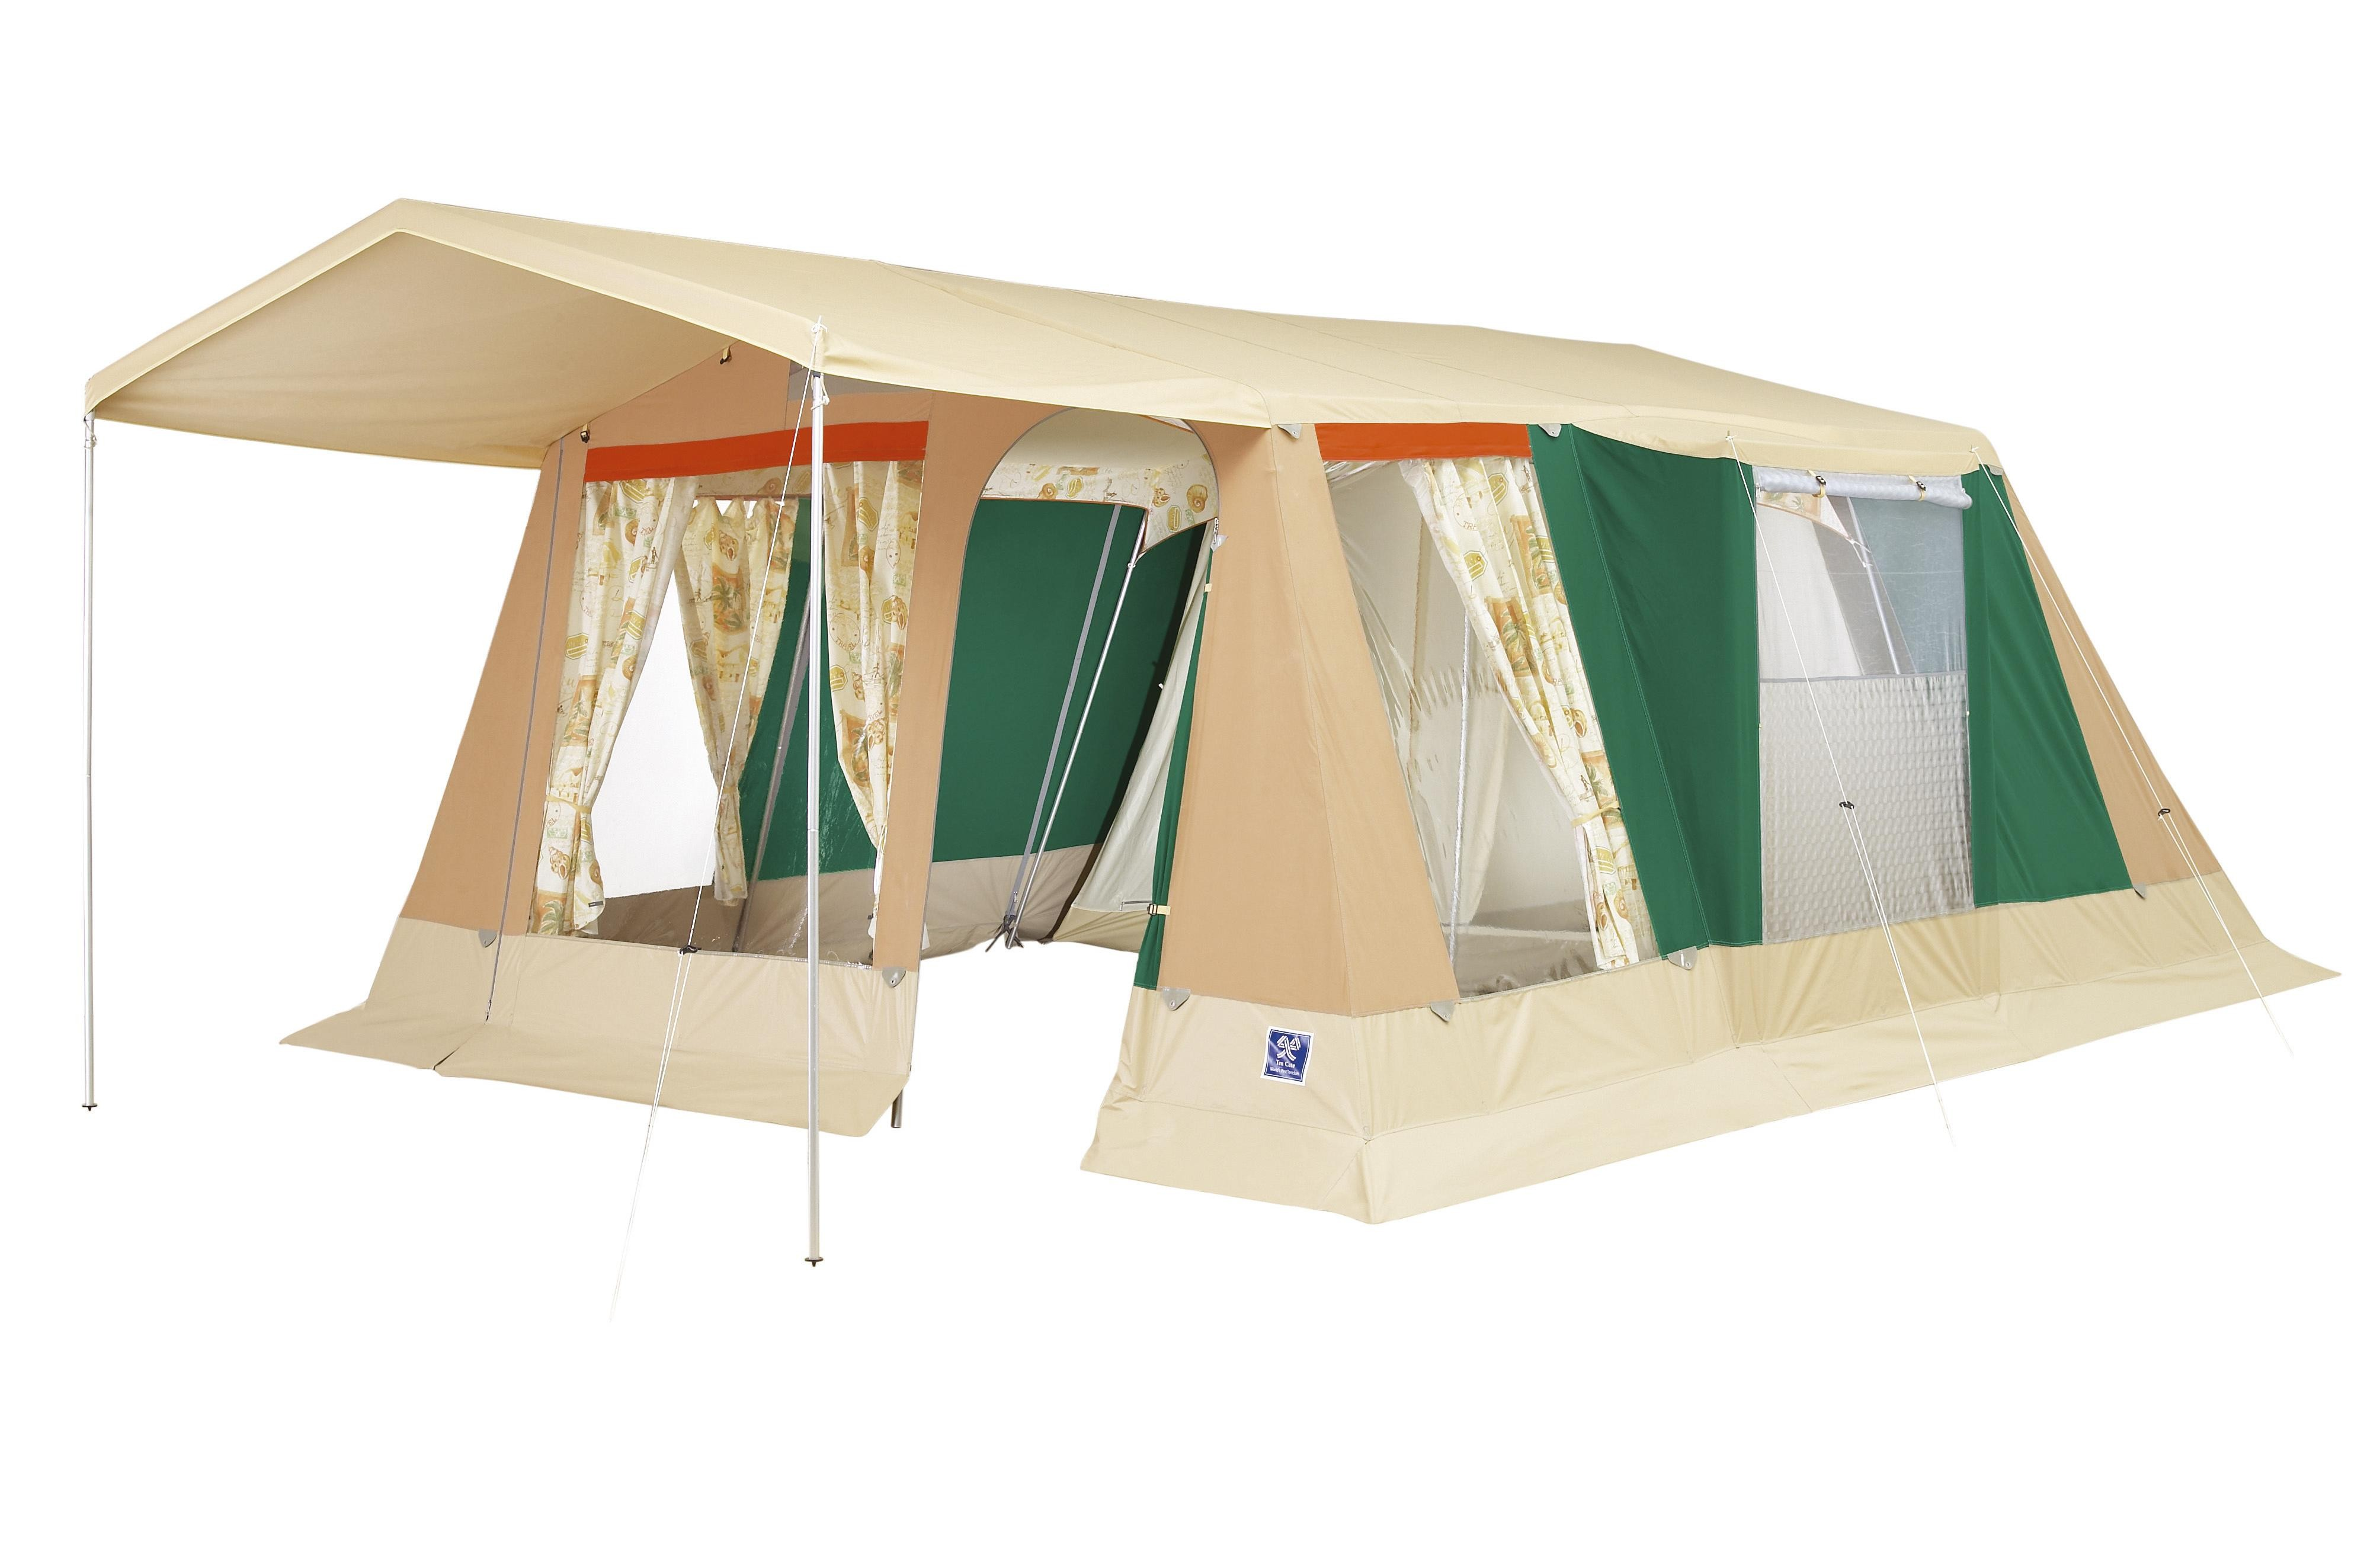 Trigano Prestige 6 Frame Tent By Trigano For 163 1 500 00